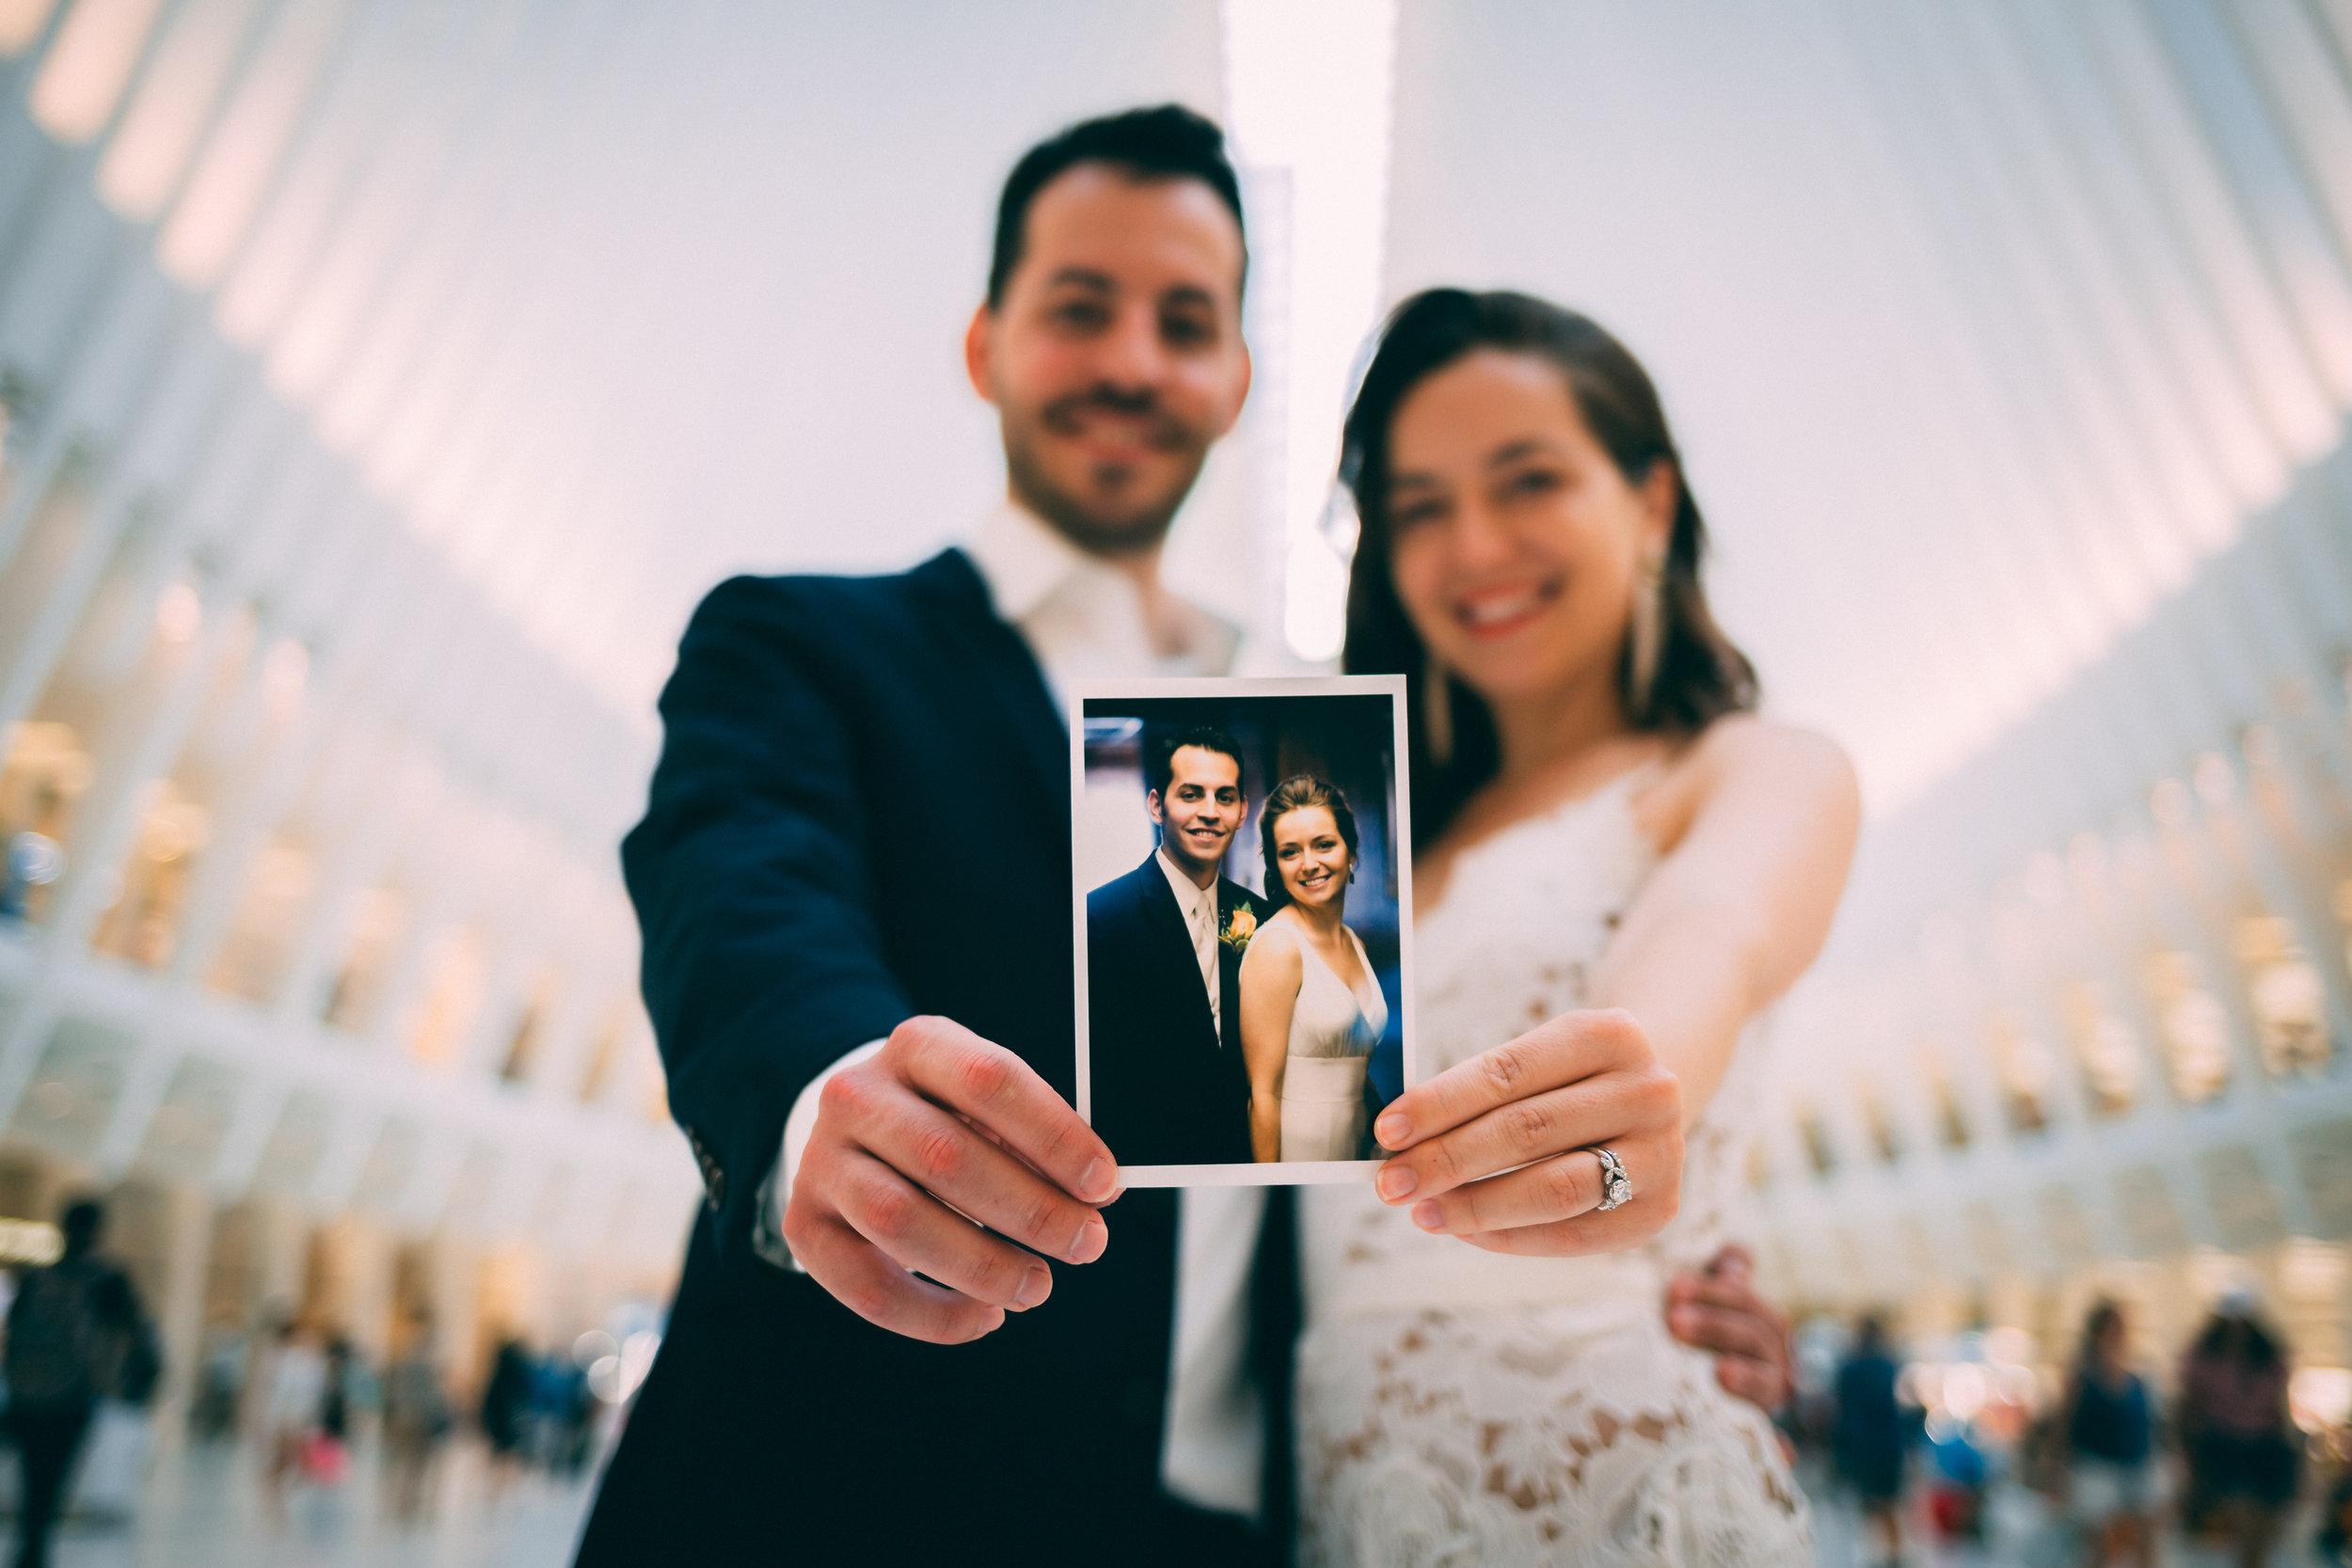 Holding our original wedding photo